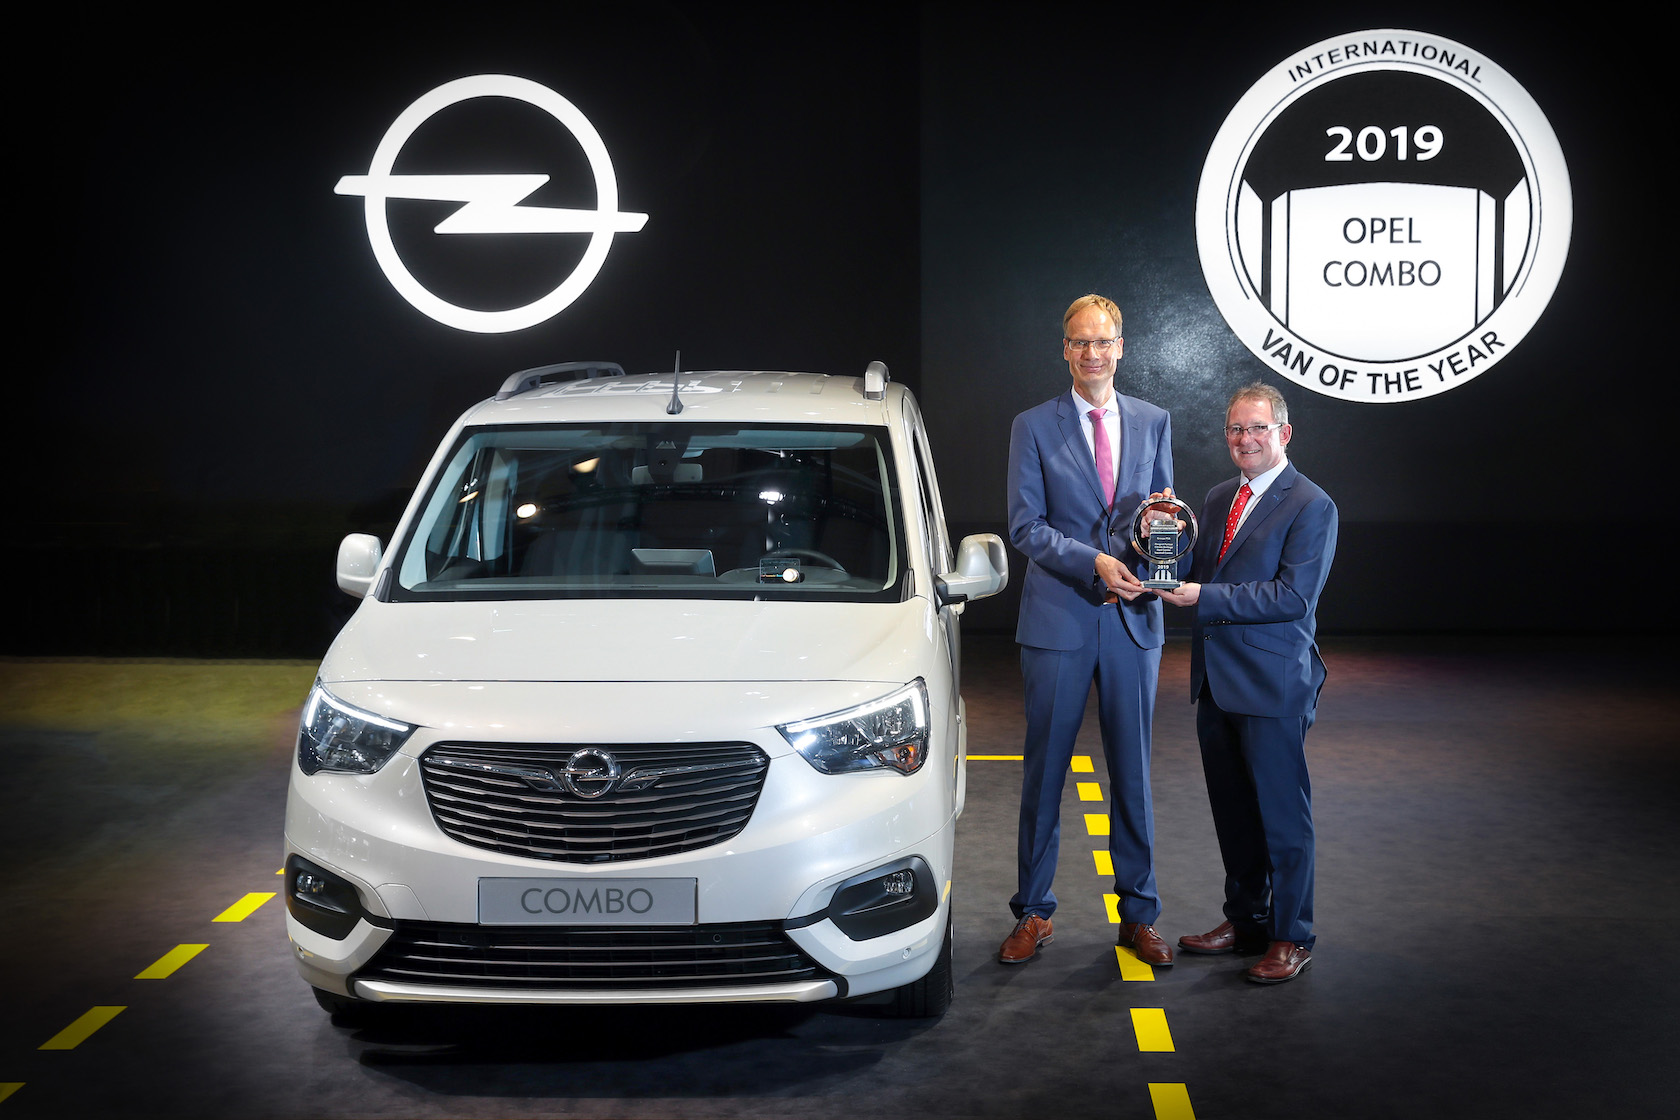 Le nouvel Opel Combo élu International Van of the Year